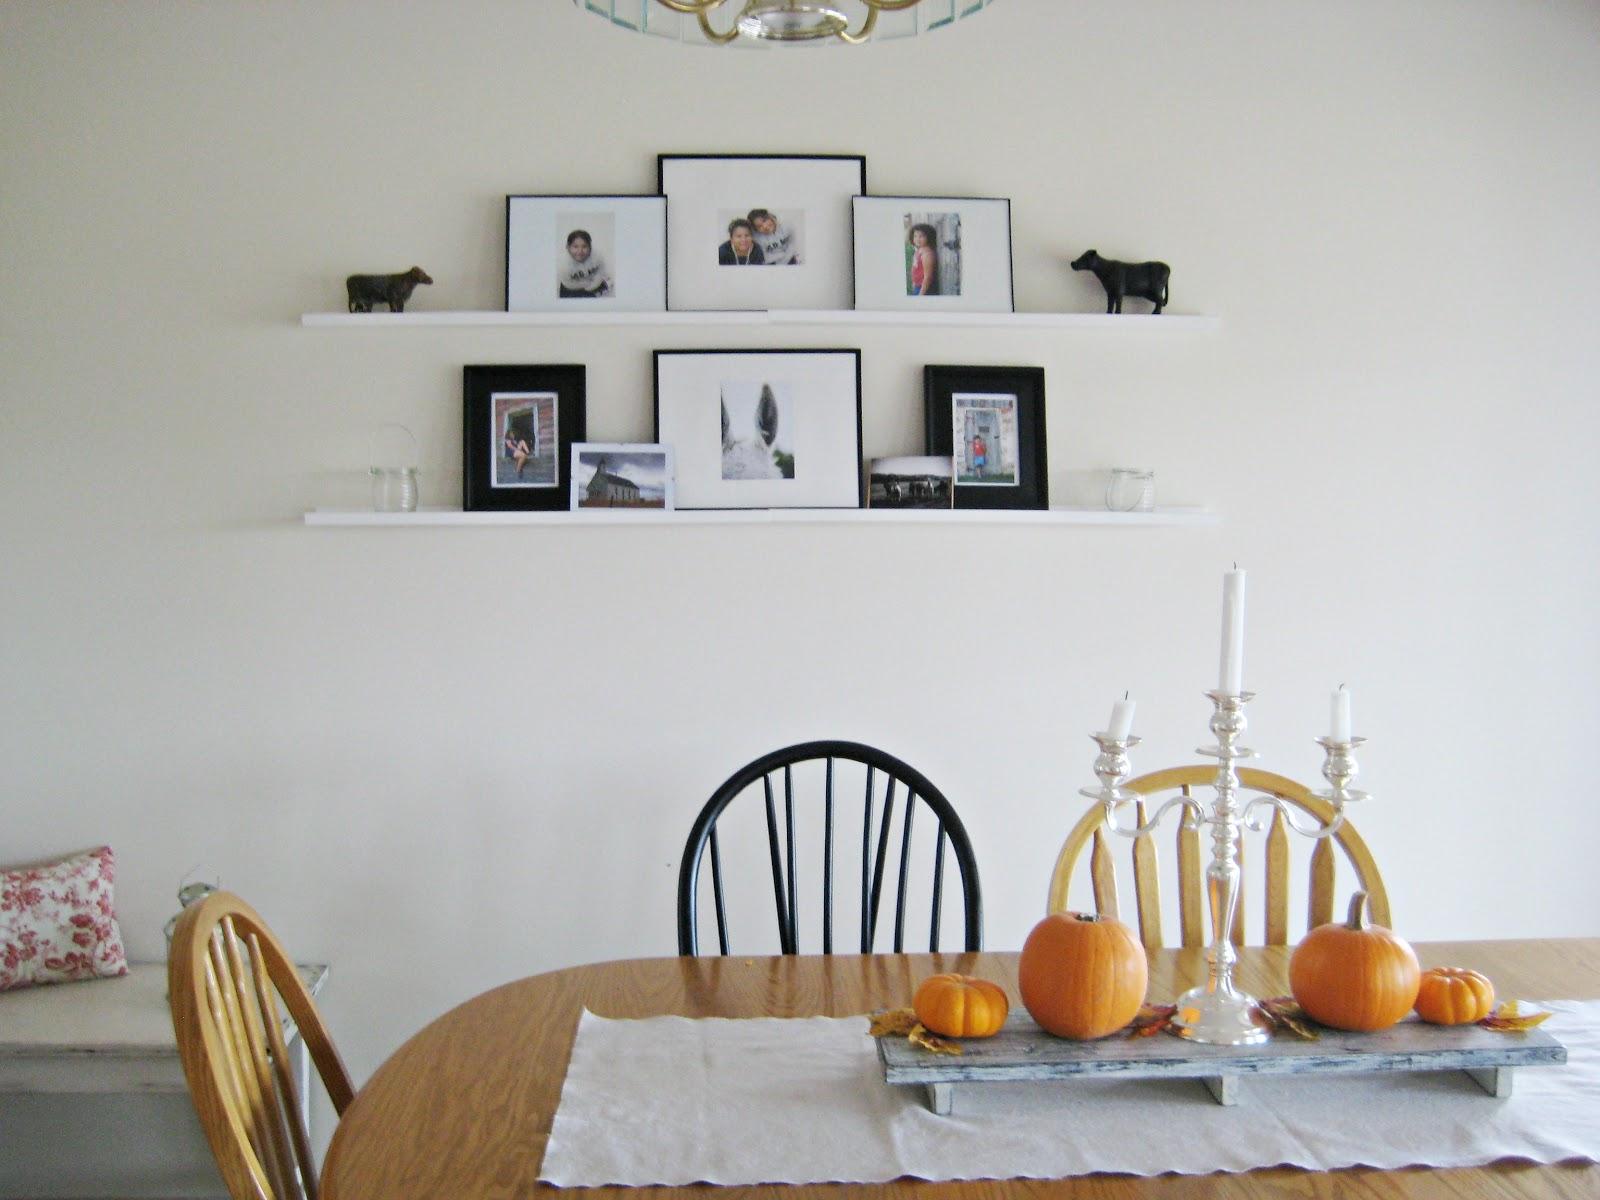 ikea picture ledge. Black Bedroom Furniture Sets. Home Design Ideas